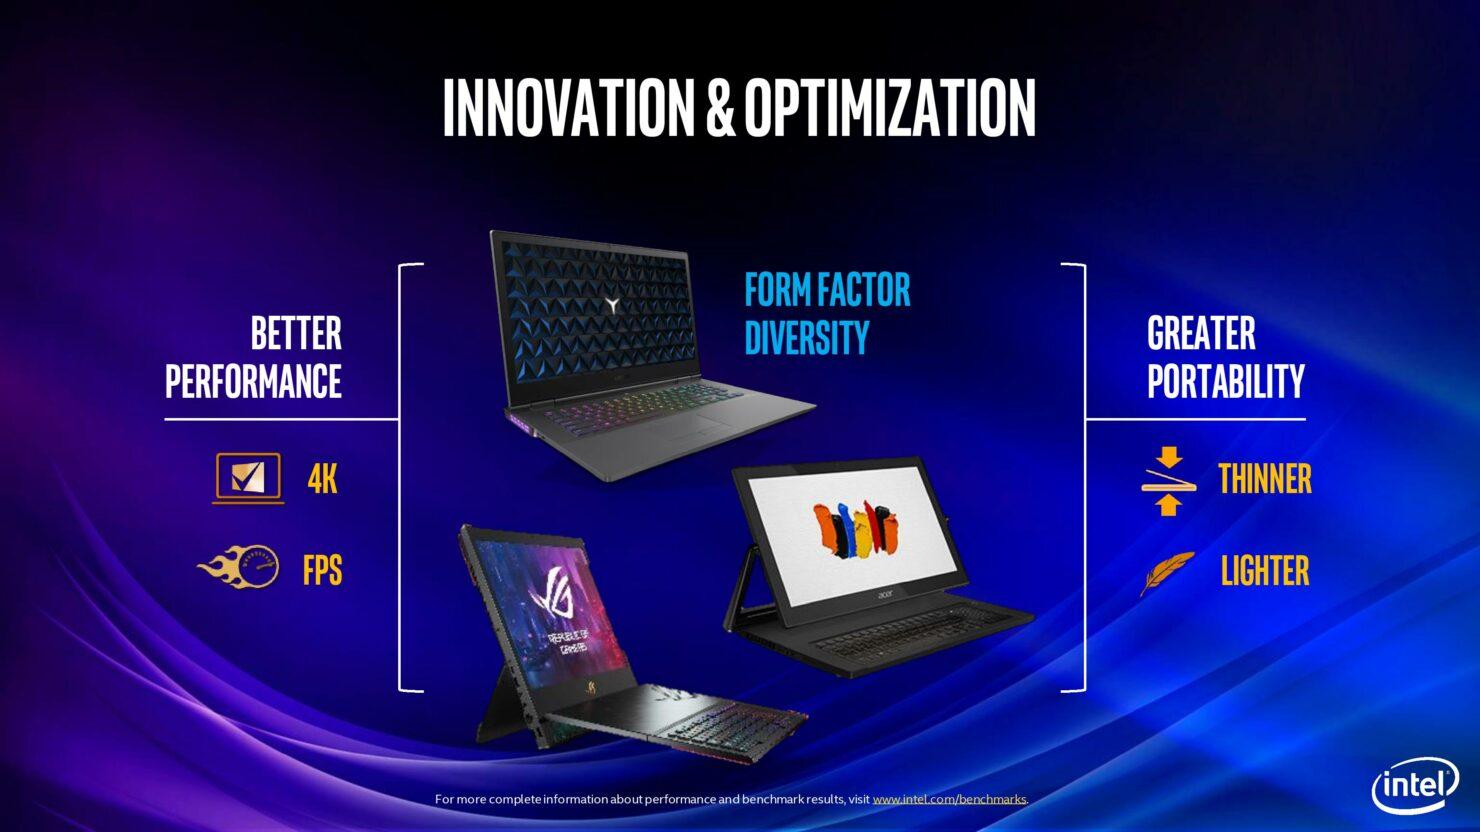 9th-gen-intel-core-mobile-launch-presentation-under-nda-until-april-23-page-014